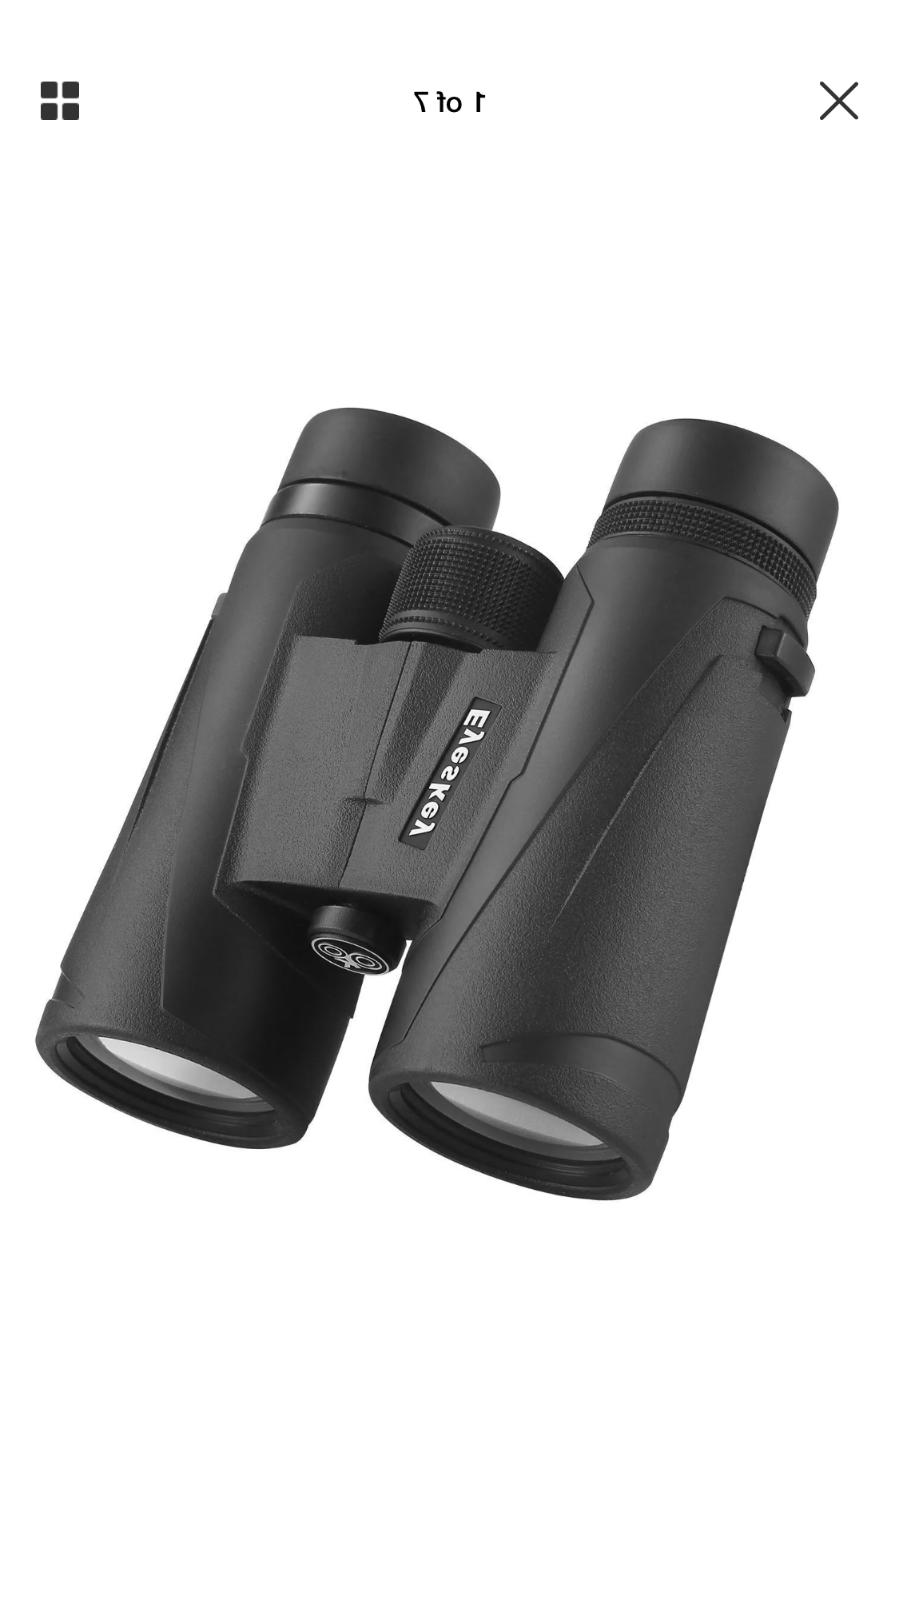 binoculars 10x42 hunting binocular waterproof with neck